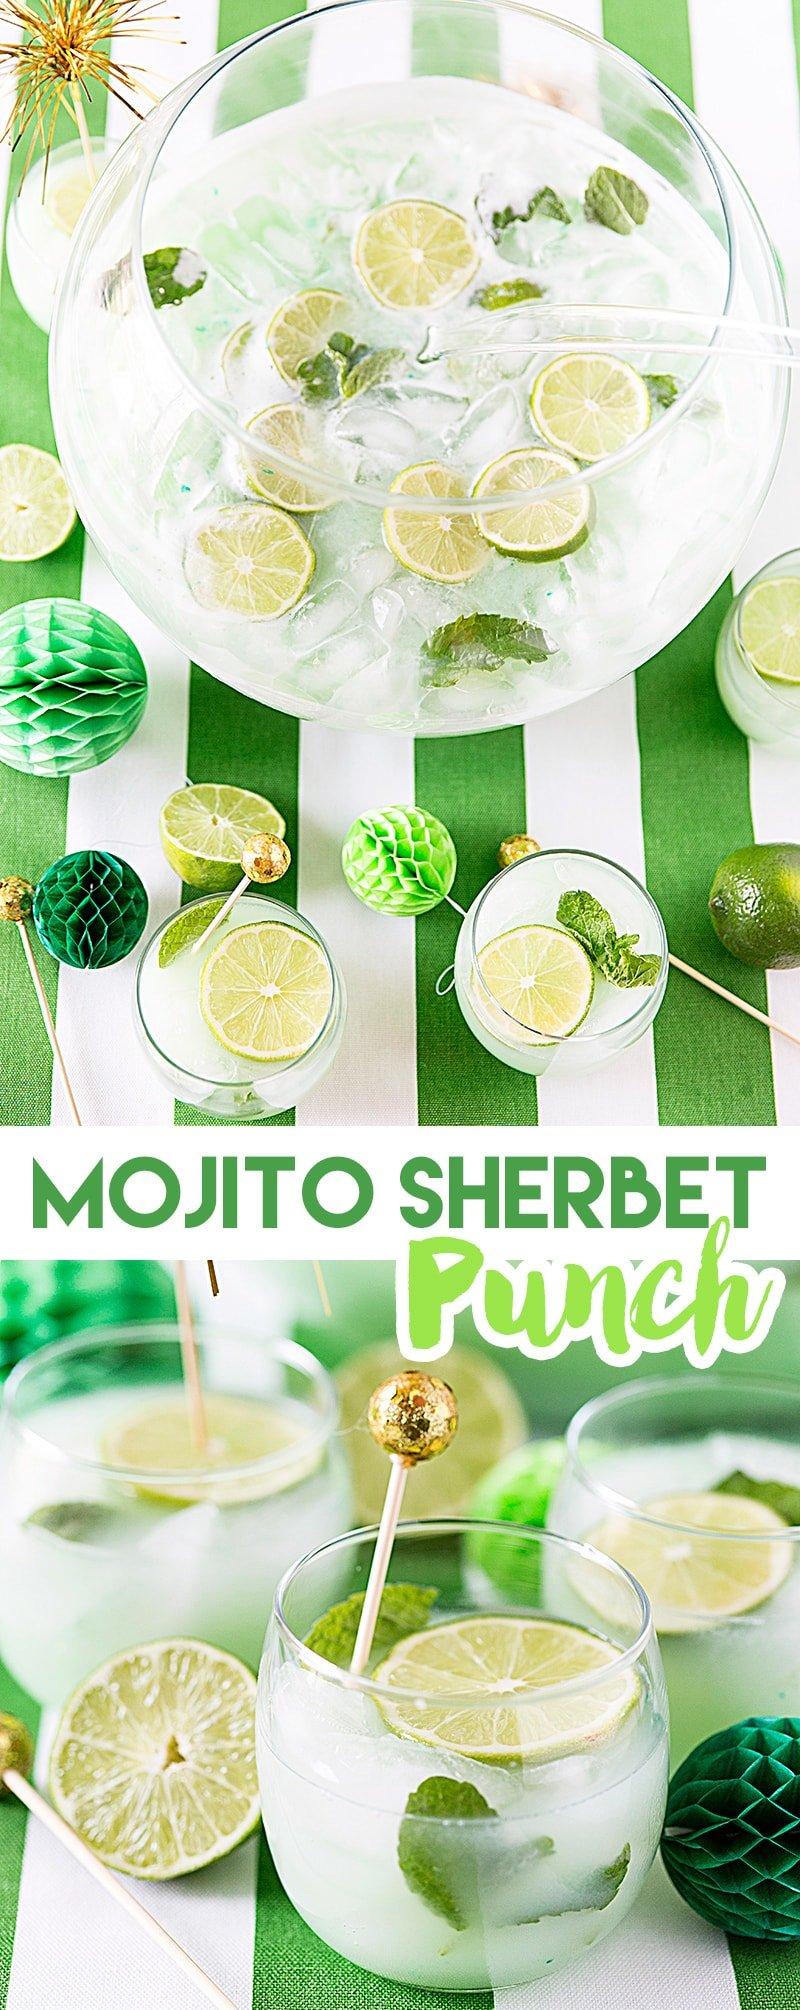 Mojito Sherbet Punch